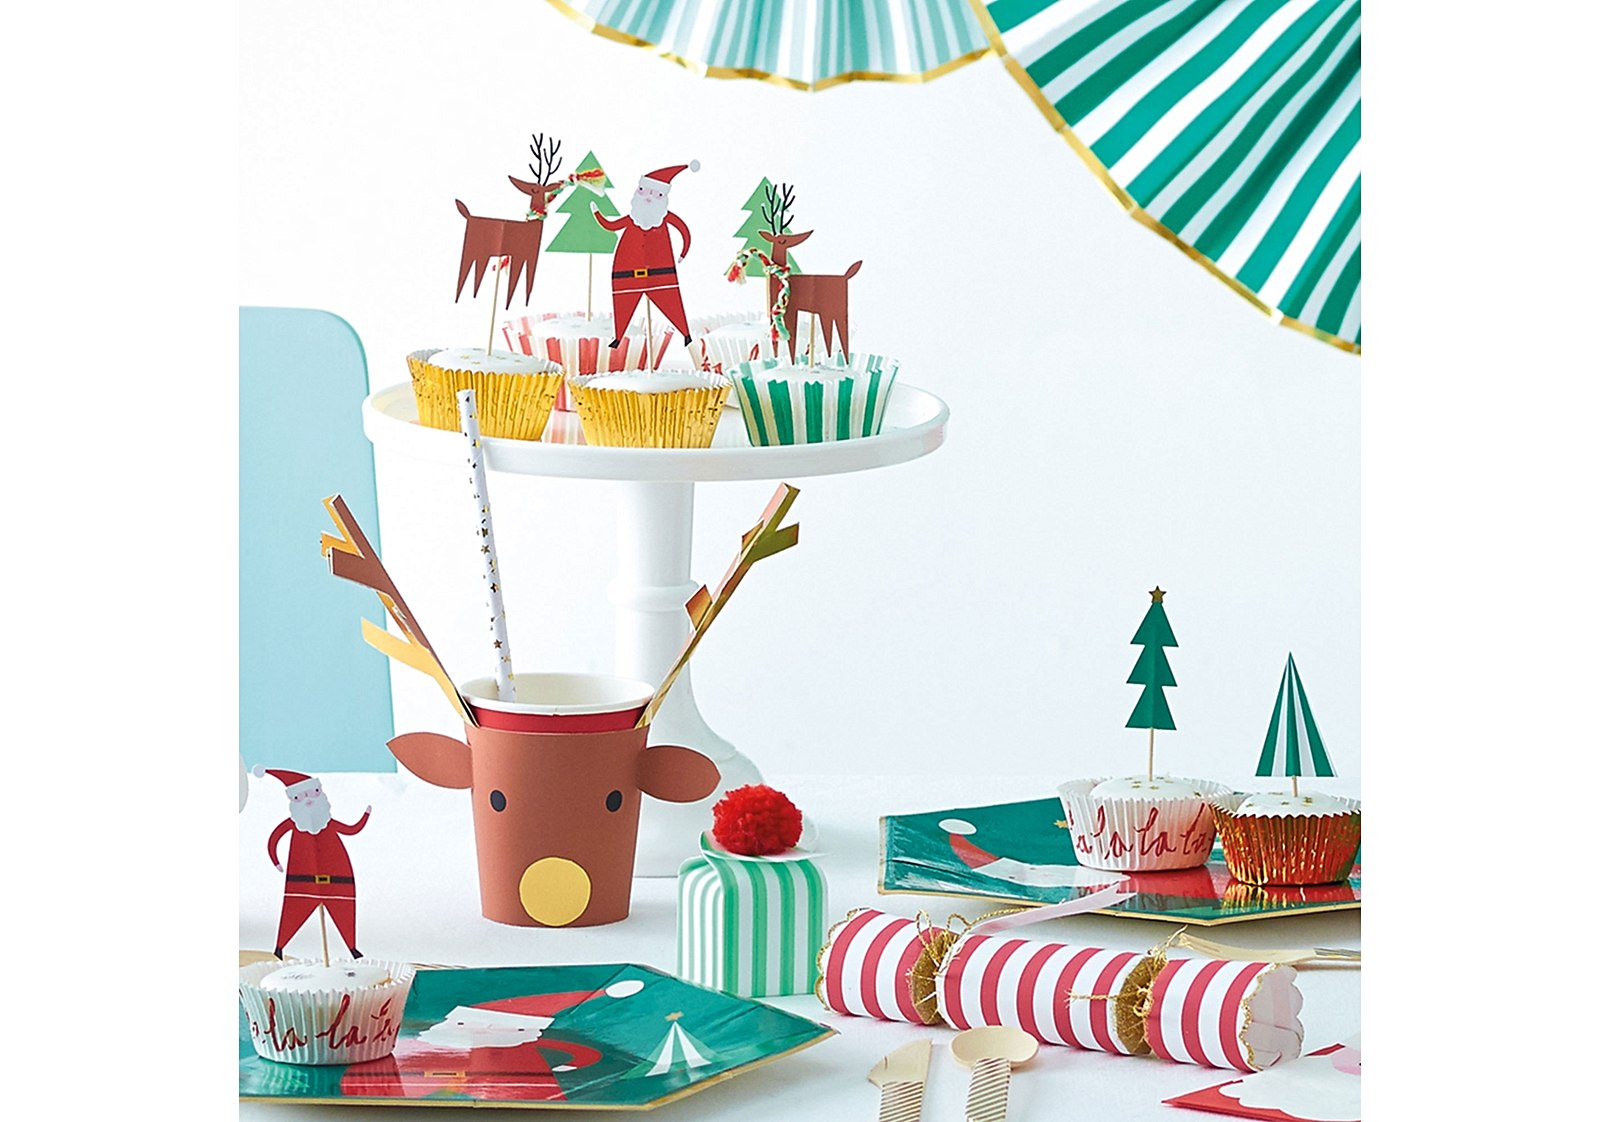 1023831_oliver-bonas_gift_xmas-cupcake-kit-r13-_2